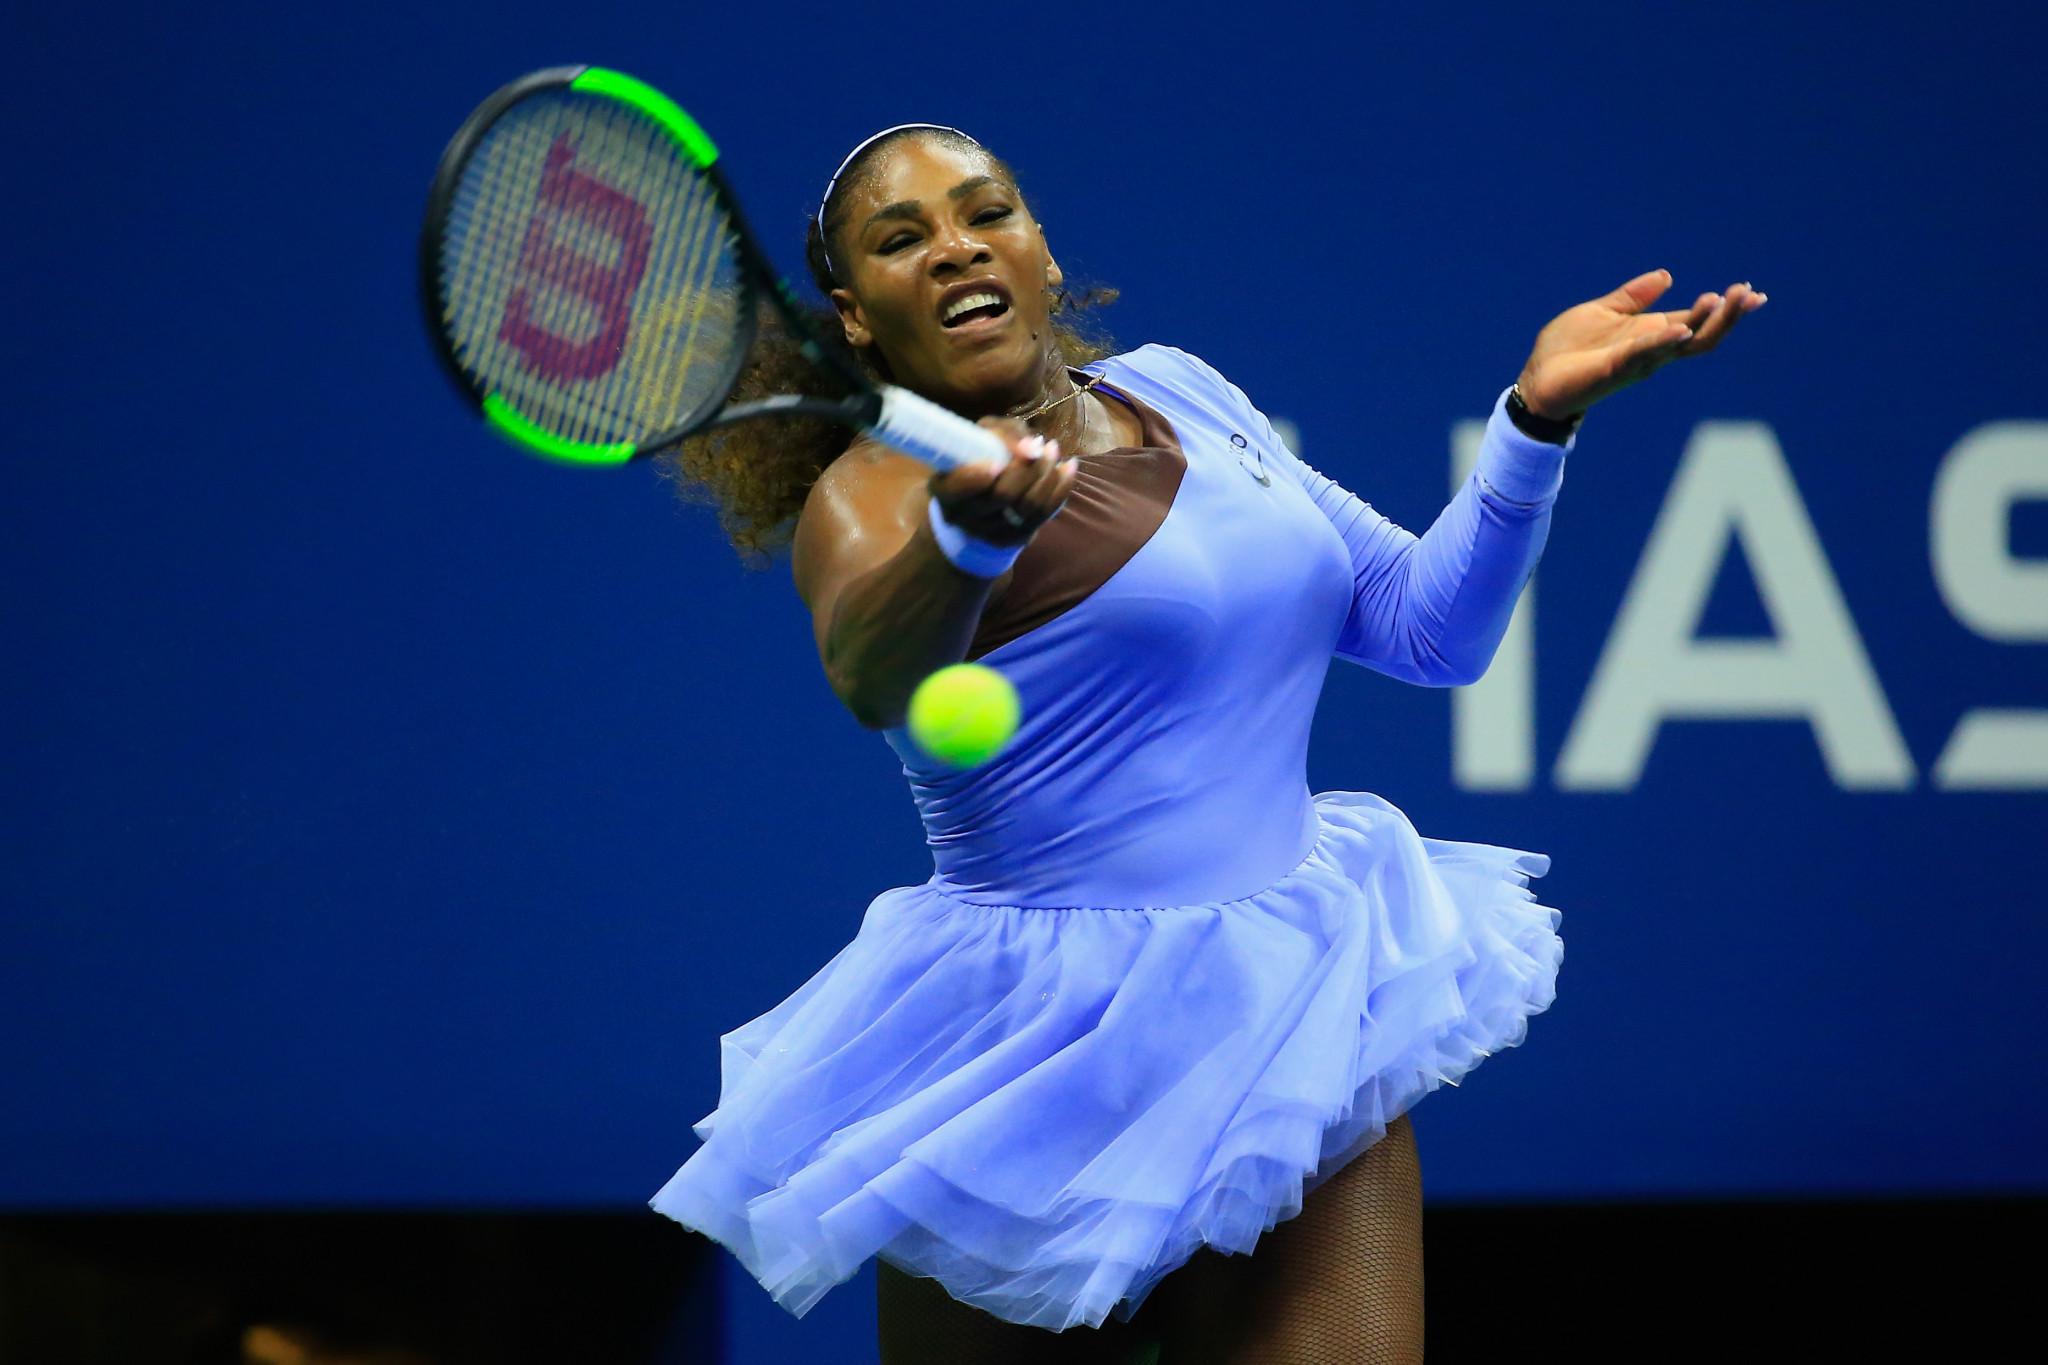 Williams thrashes Sevastova to reach US Open final